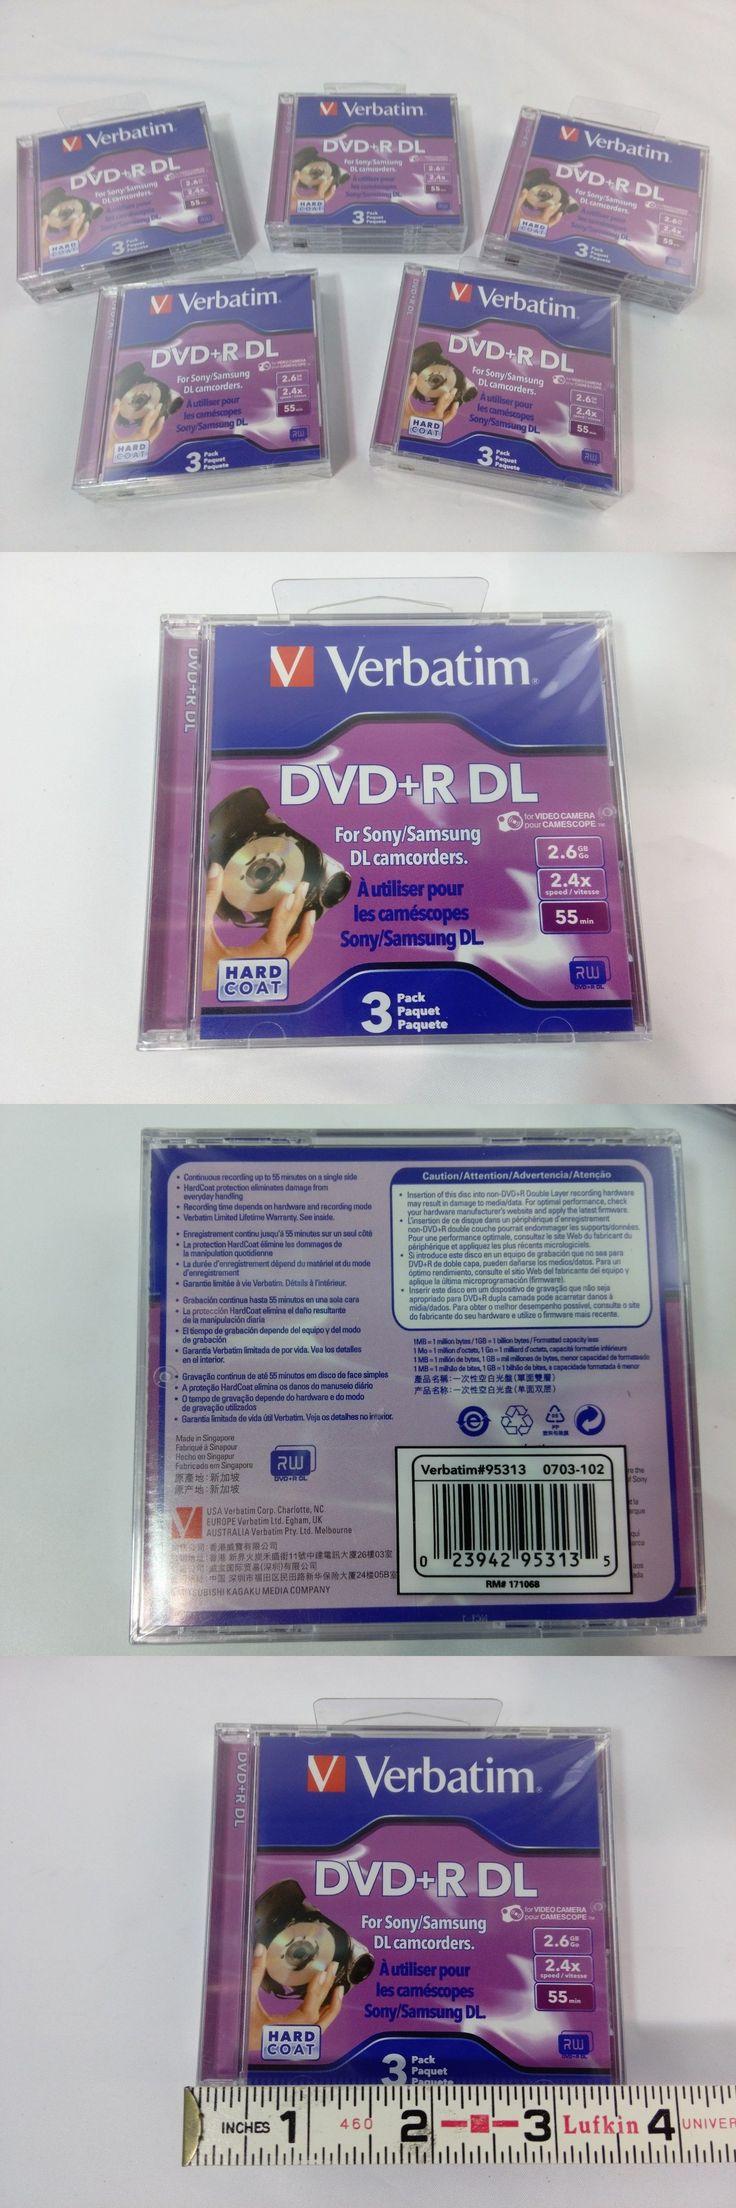 Verbatim dvd rw 4 7gb 4x with branded surface 30pk spindle 4 7gb - Cd Dvd And Blu Ray Discs 9 Pack Verbatim 2 4x Mini Dvd